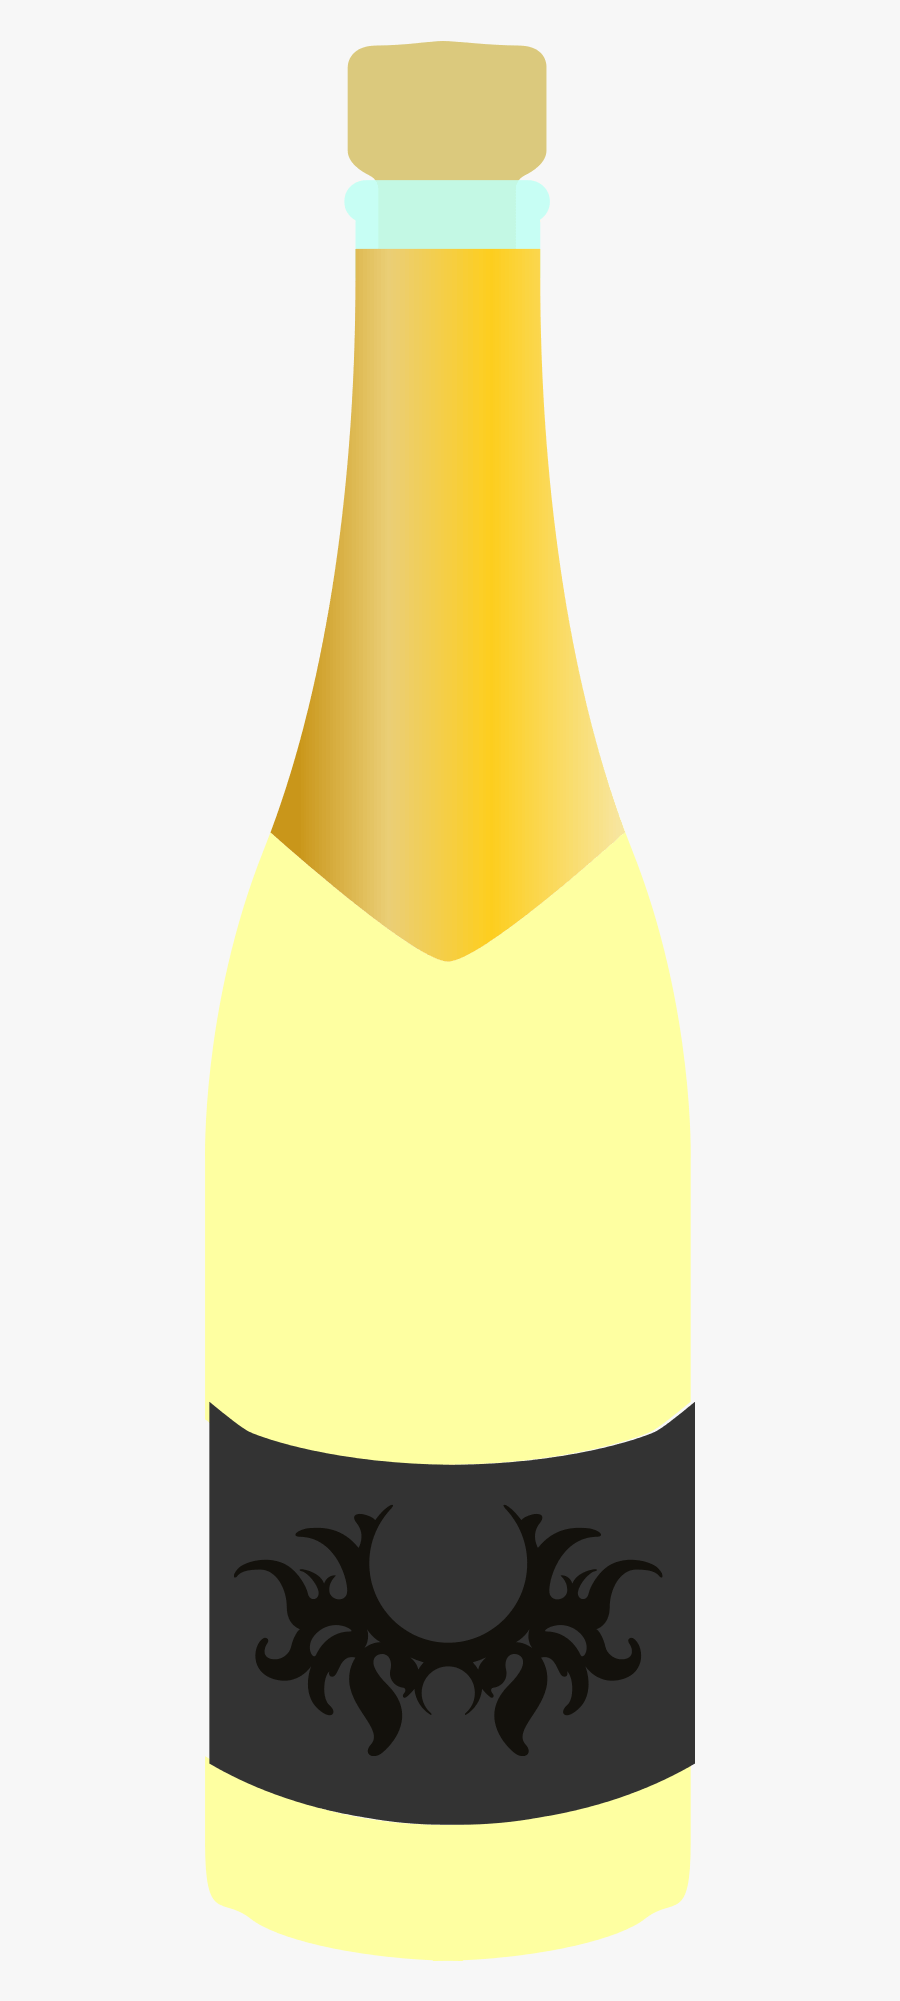 Flaša Šampanského Png, Transparent Clipart